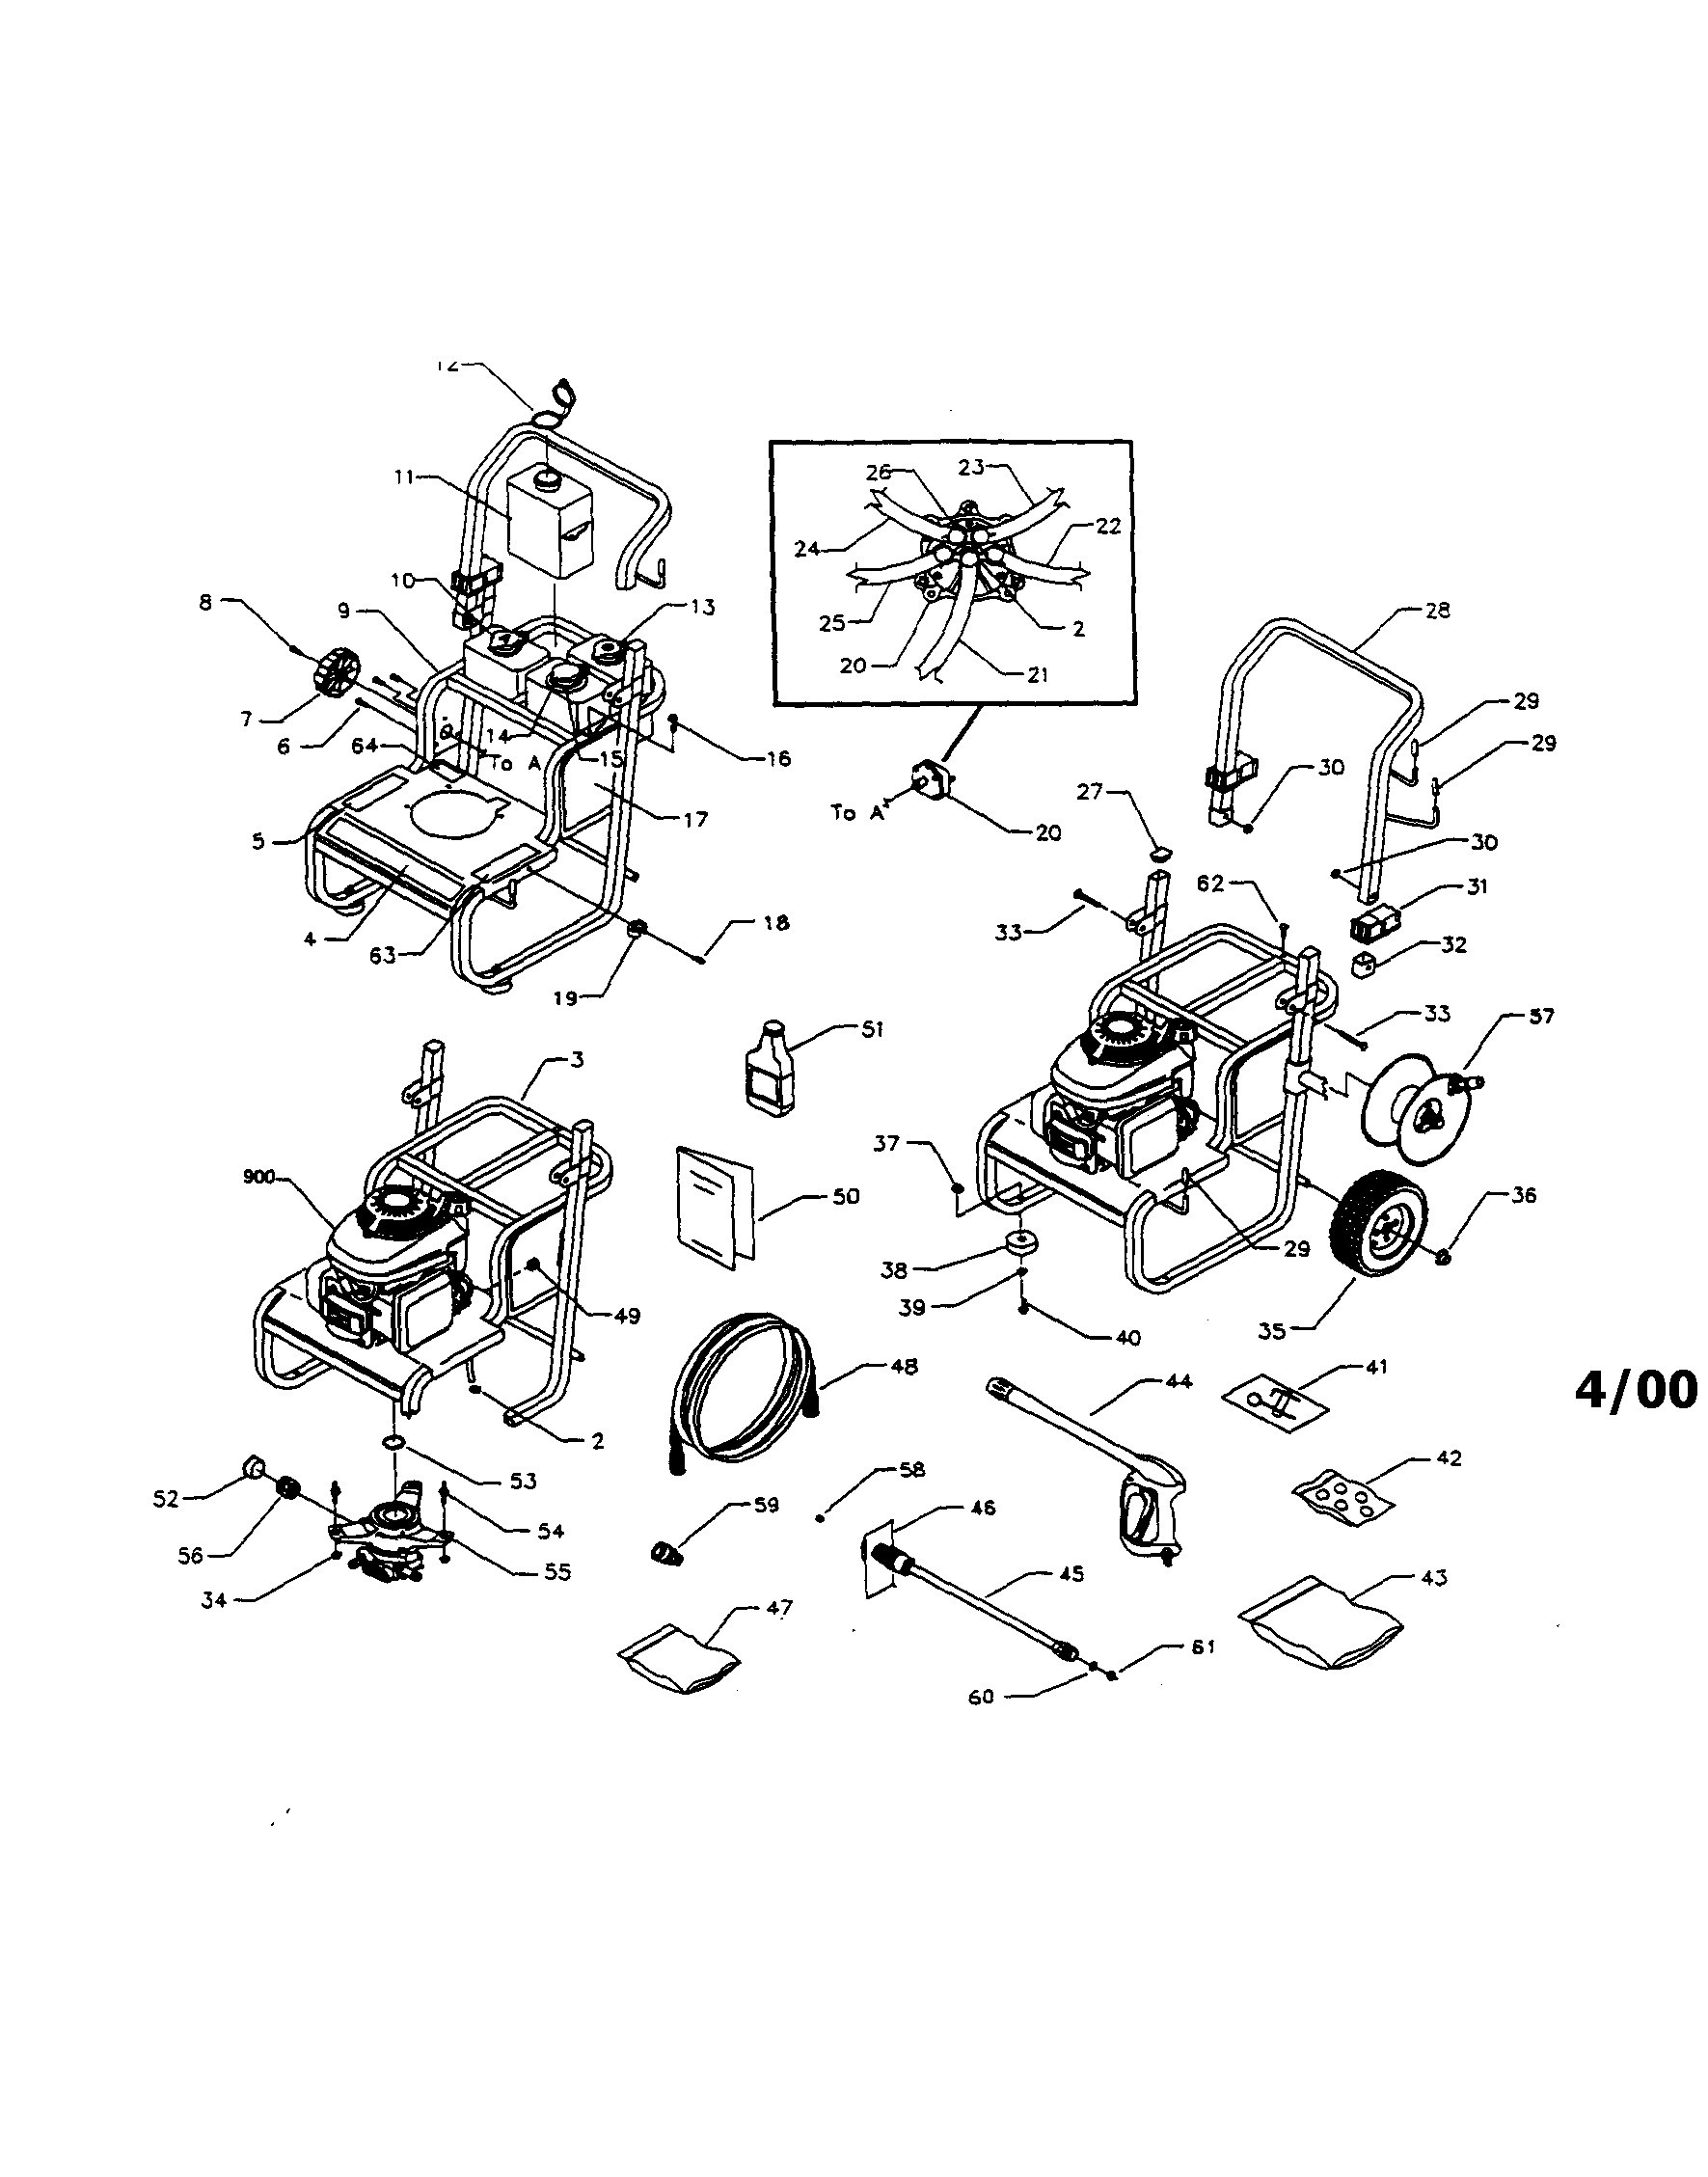 Honda Gcv160 Engine Parts Diagram Honda Gc160 Parts Diagram Craftsman Model Power Washer Gas Genuine Of Honda Gcv160 Engine Parts Diagram